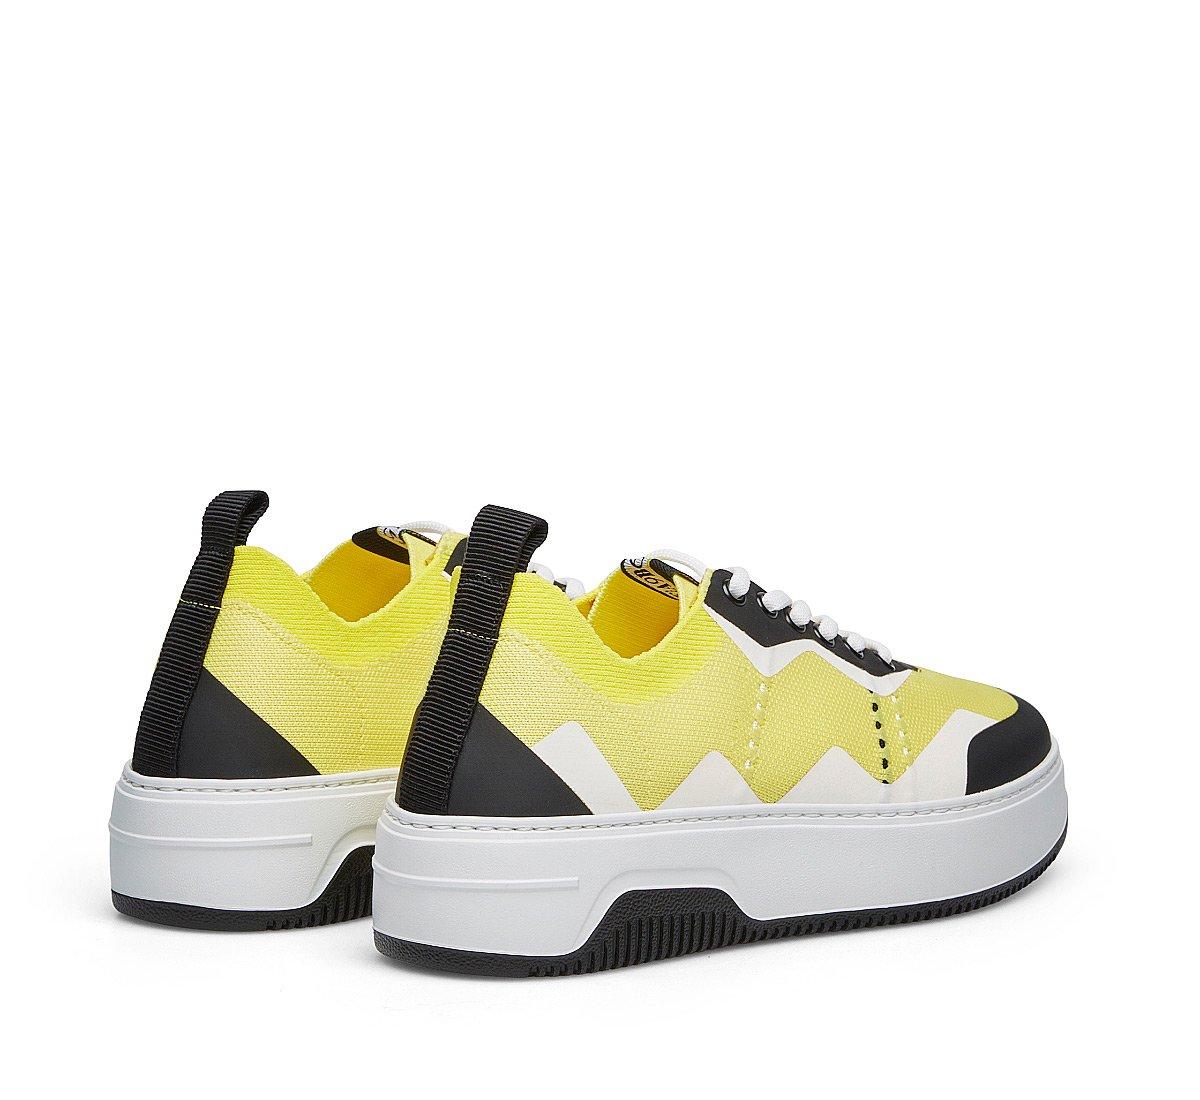 Fabi WAVE sneakers